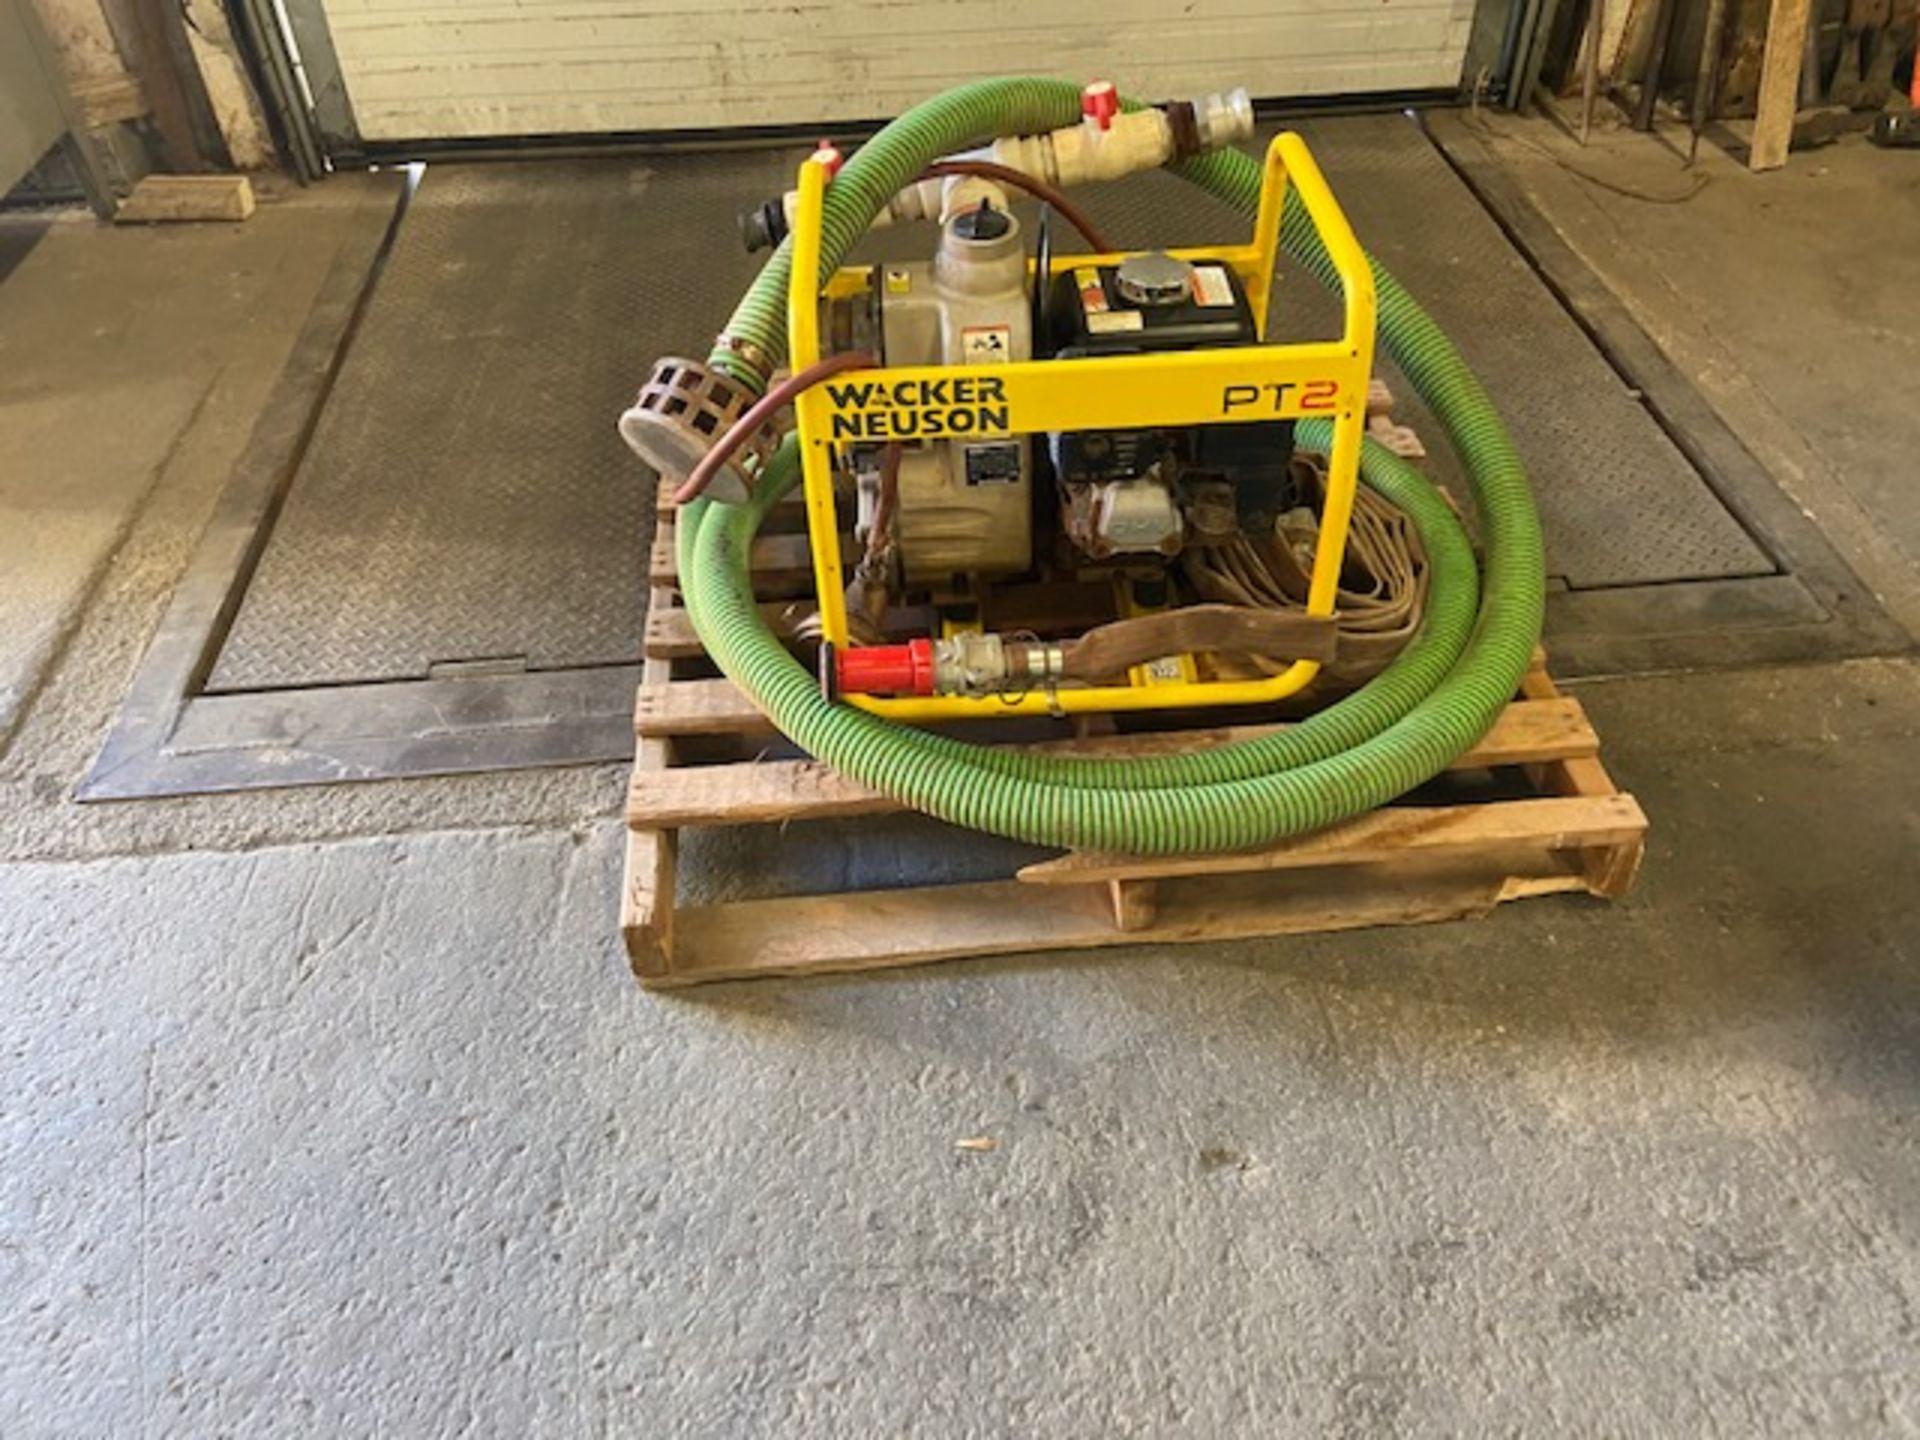 Wacker Neuson PT2 Water Pump Unit with Honda GX160 Motor